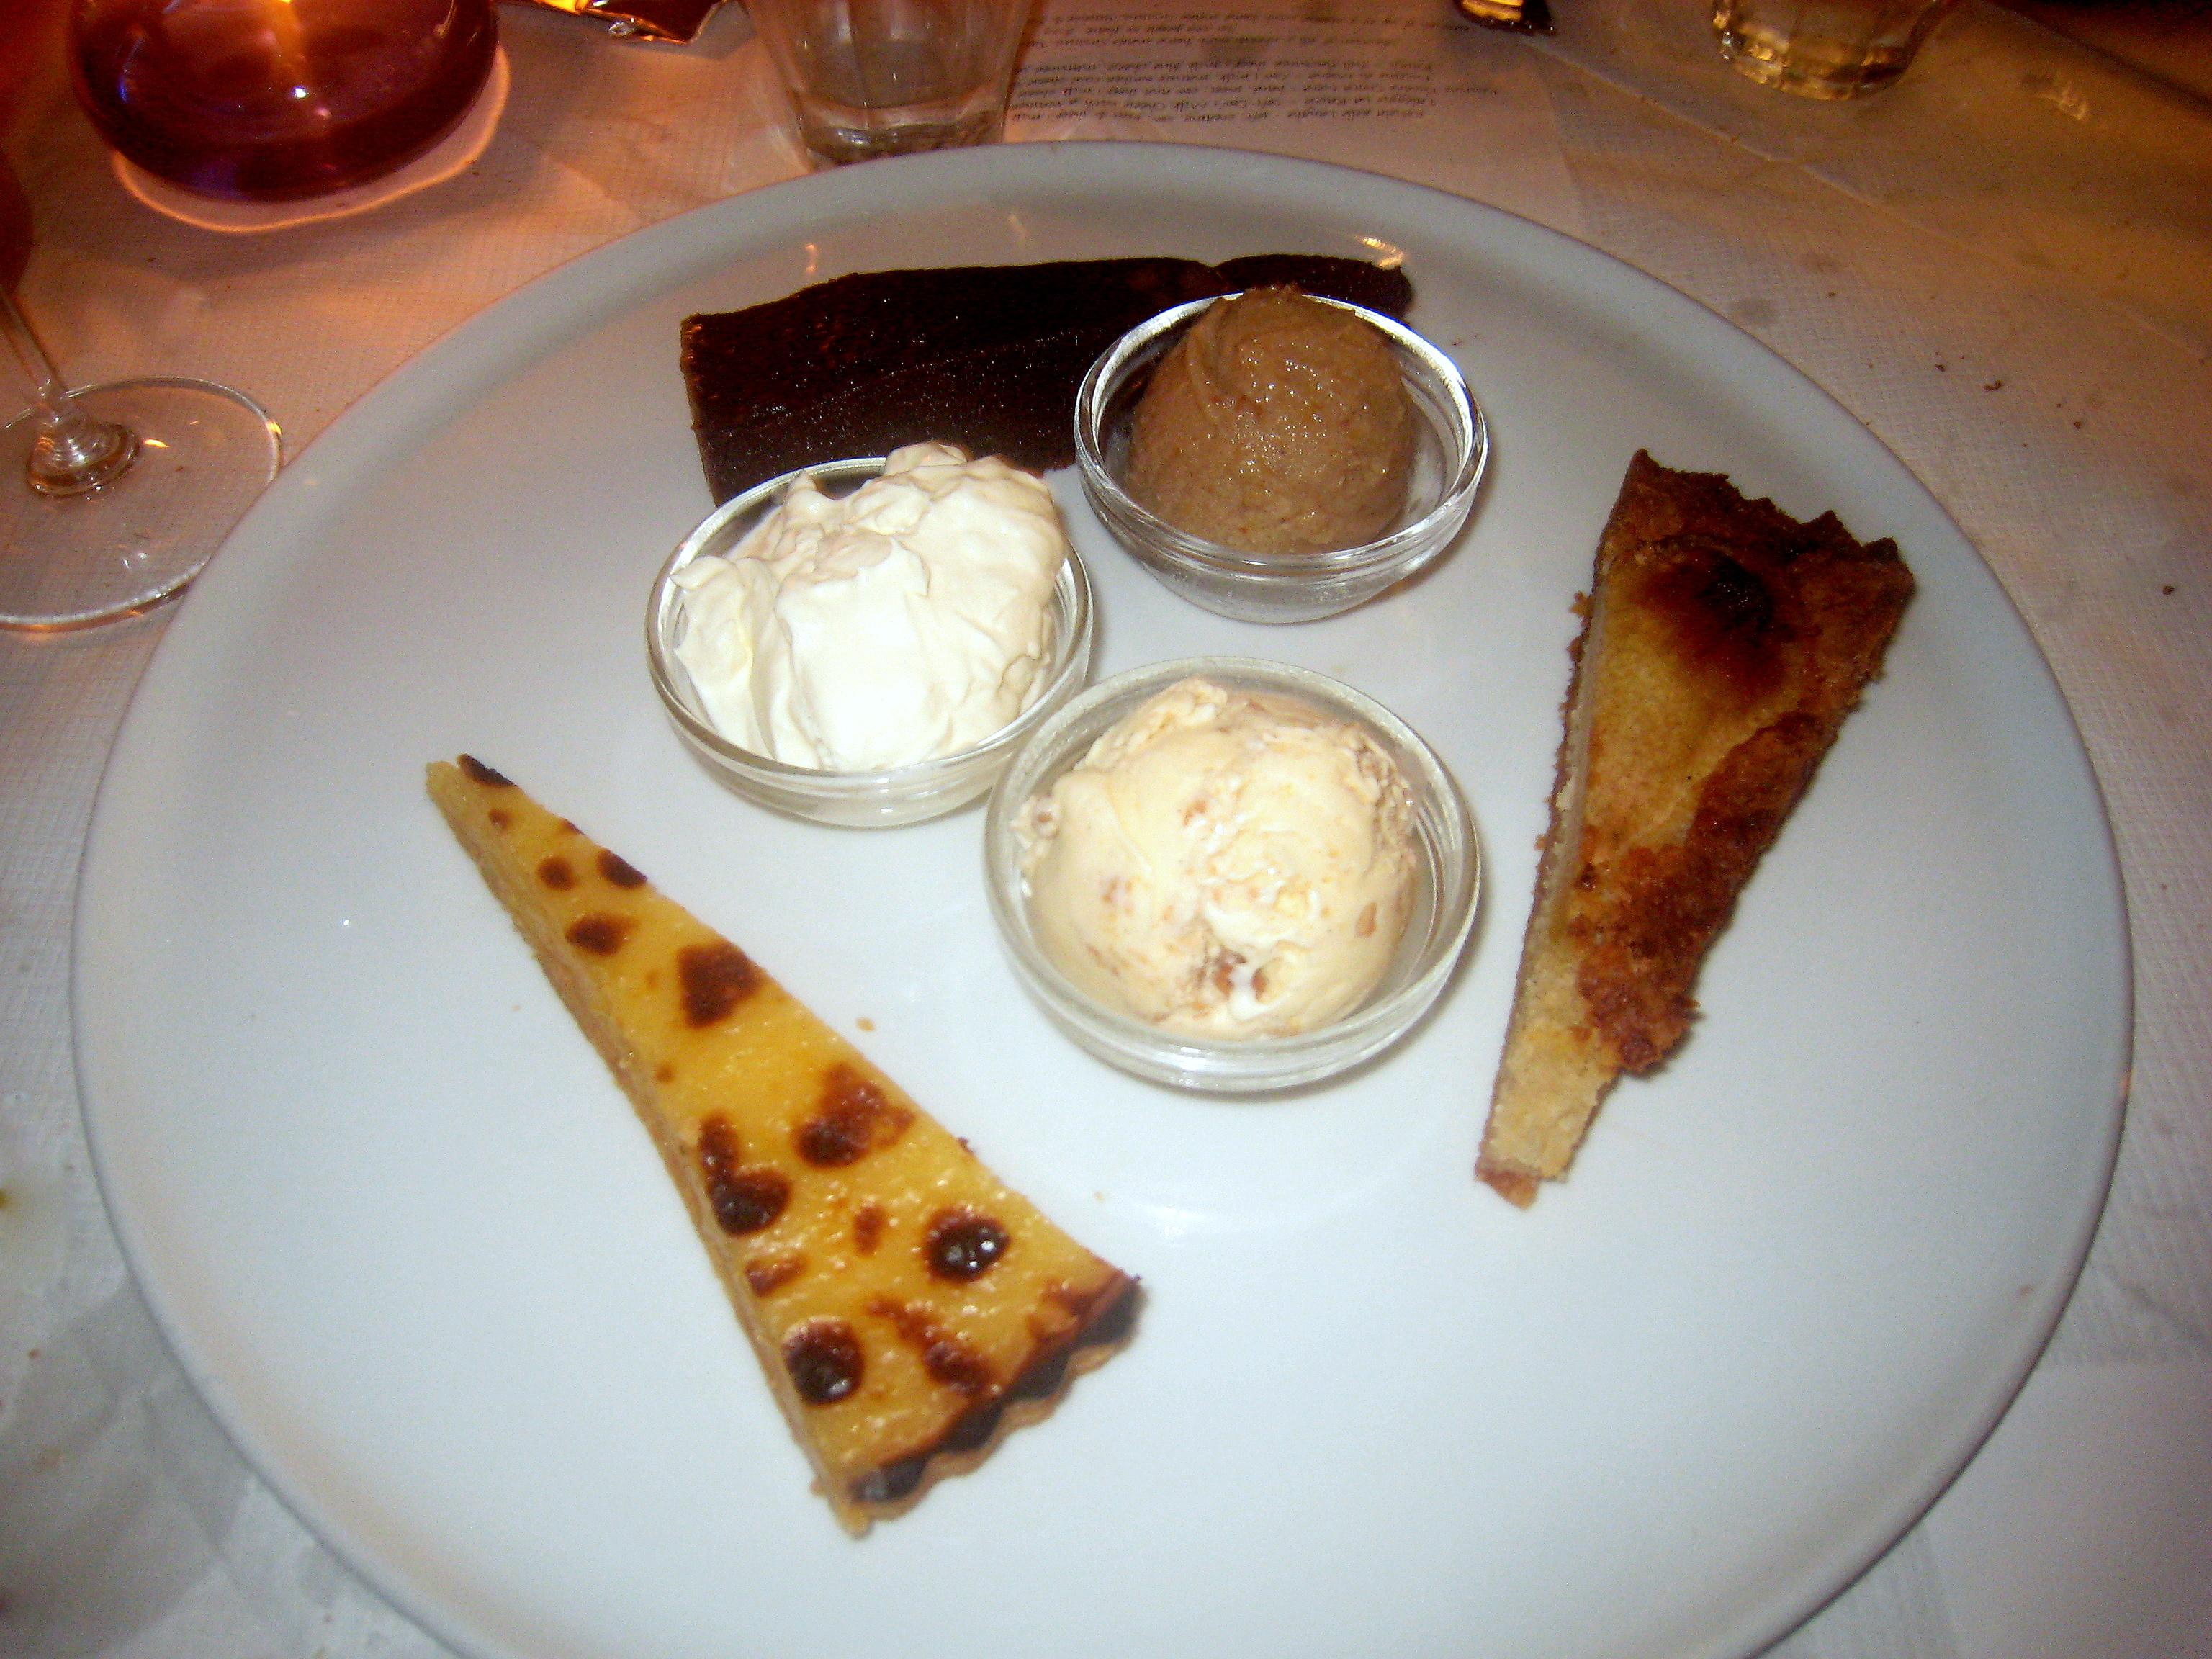 Tart; Pear & Almond Tart; Chocolate Nemesis; Chestnut Sorbet; Toasted ...